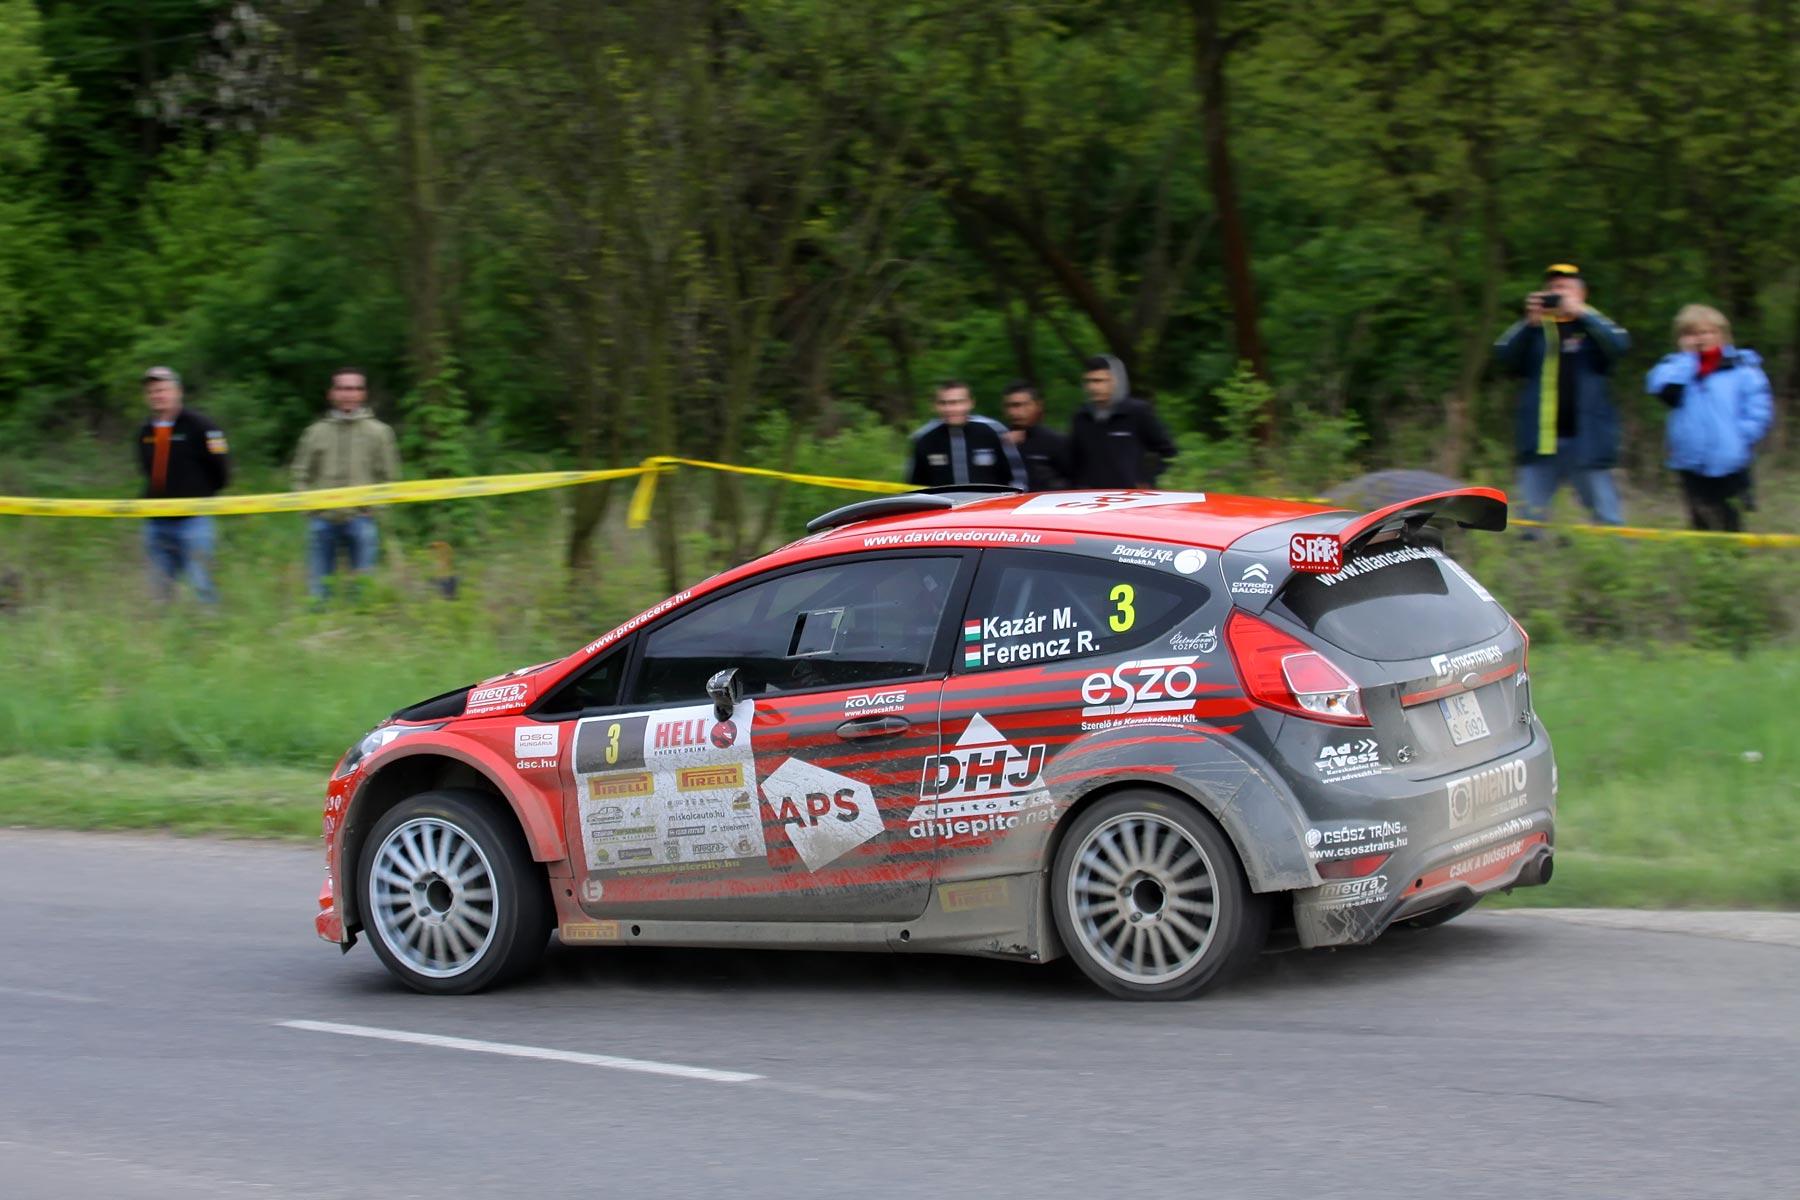 22. Hell Miskolc Rallye - Miskolc